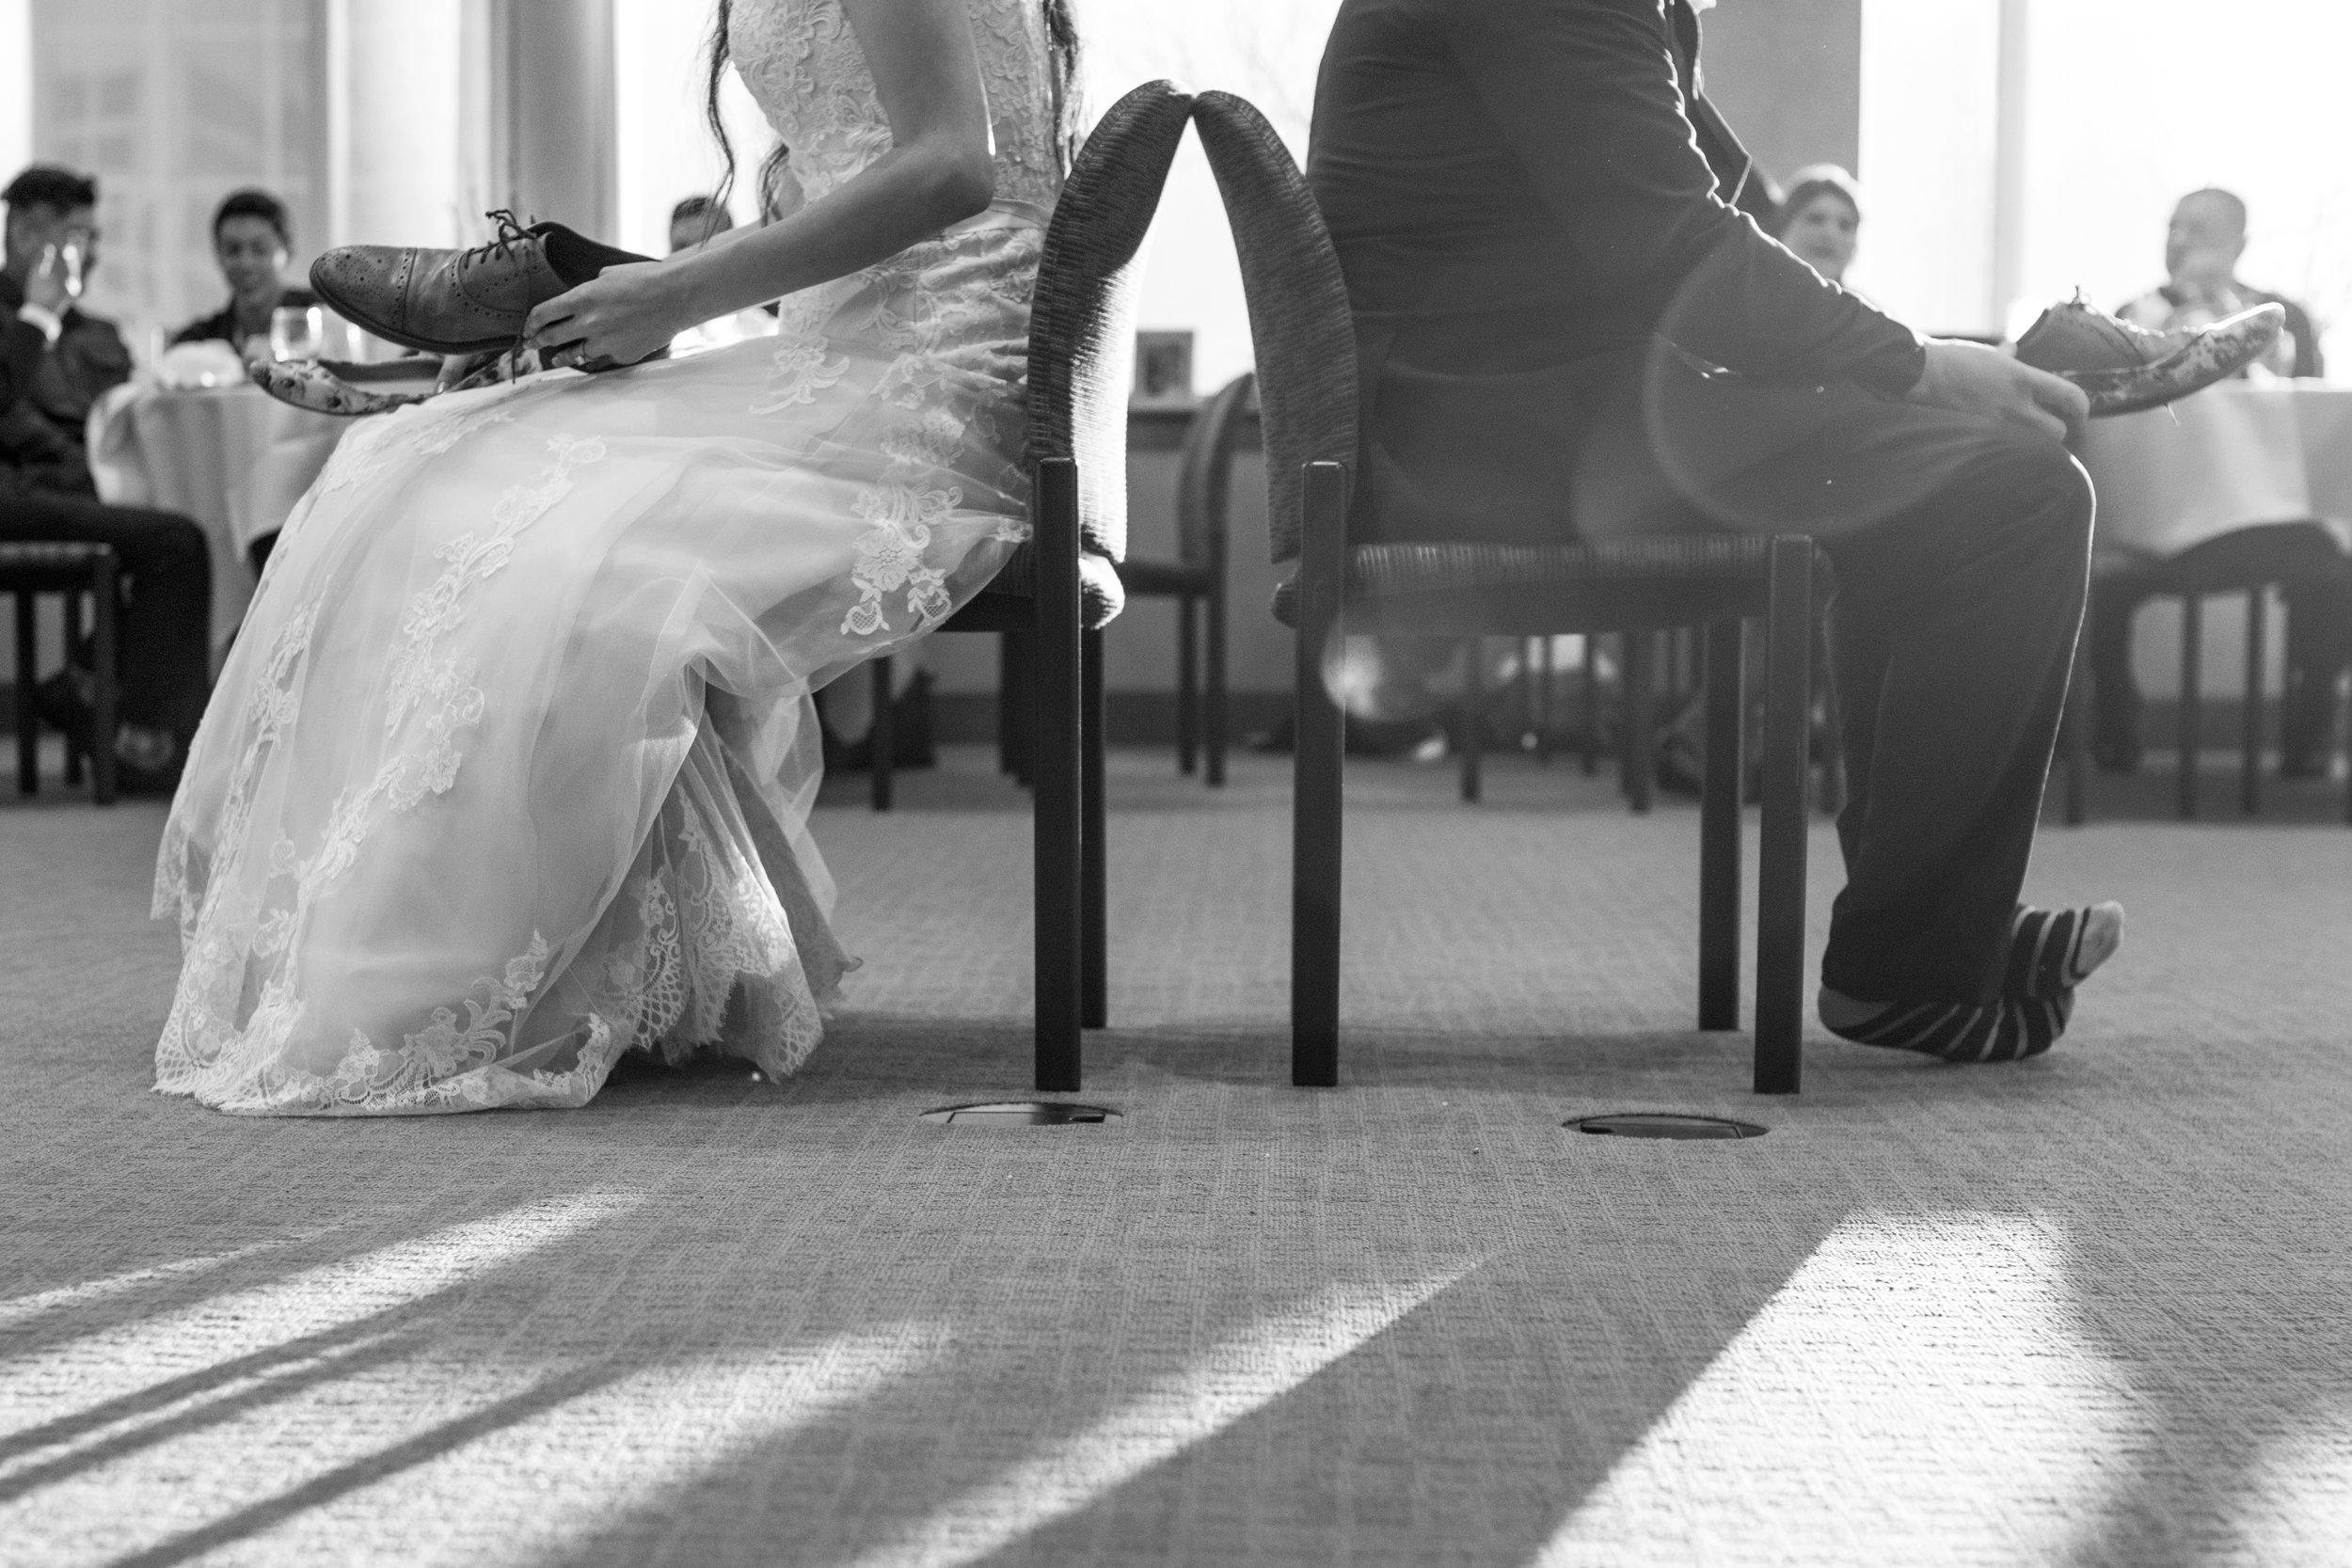 Utah Spring Wedding Reception in the Zions Bank Founders Room by Bri Bergman Photography17.jpg